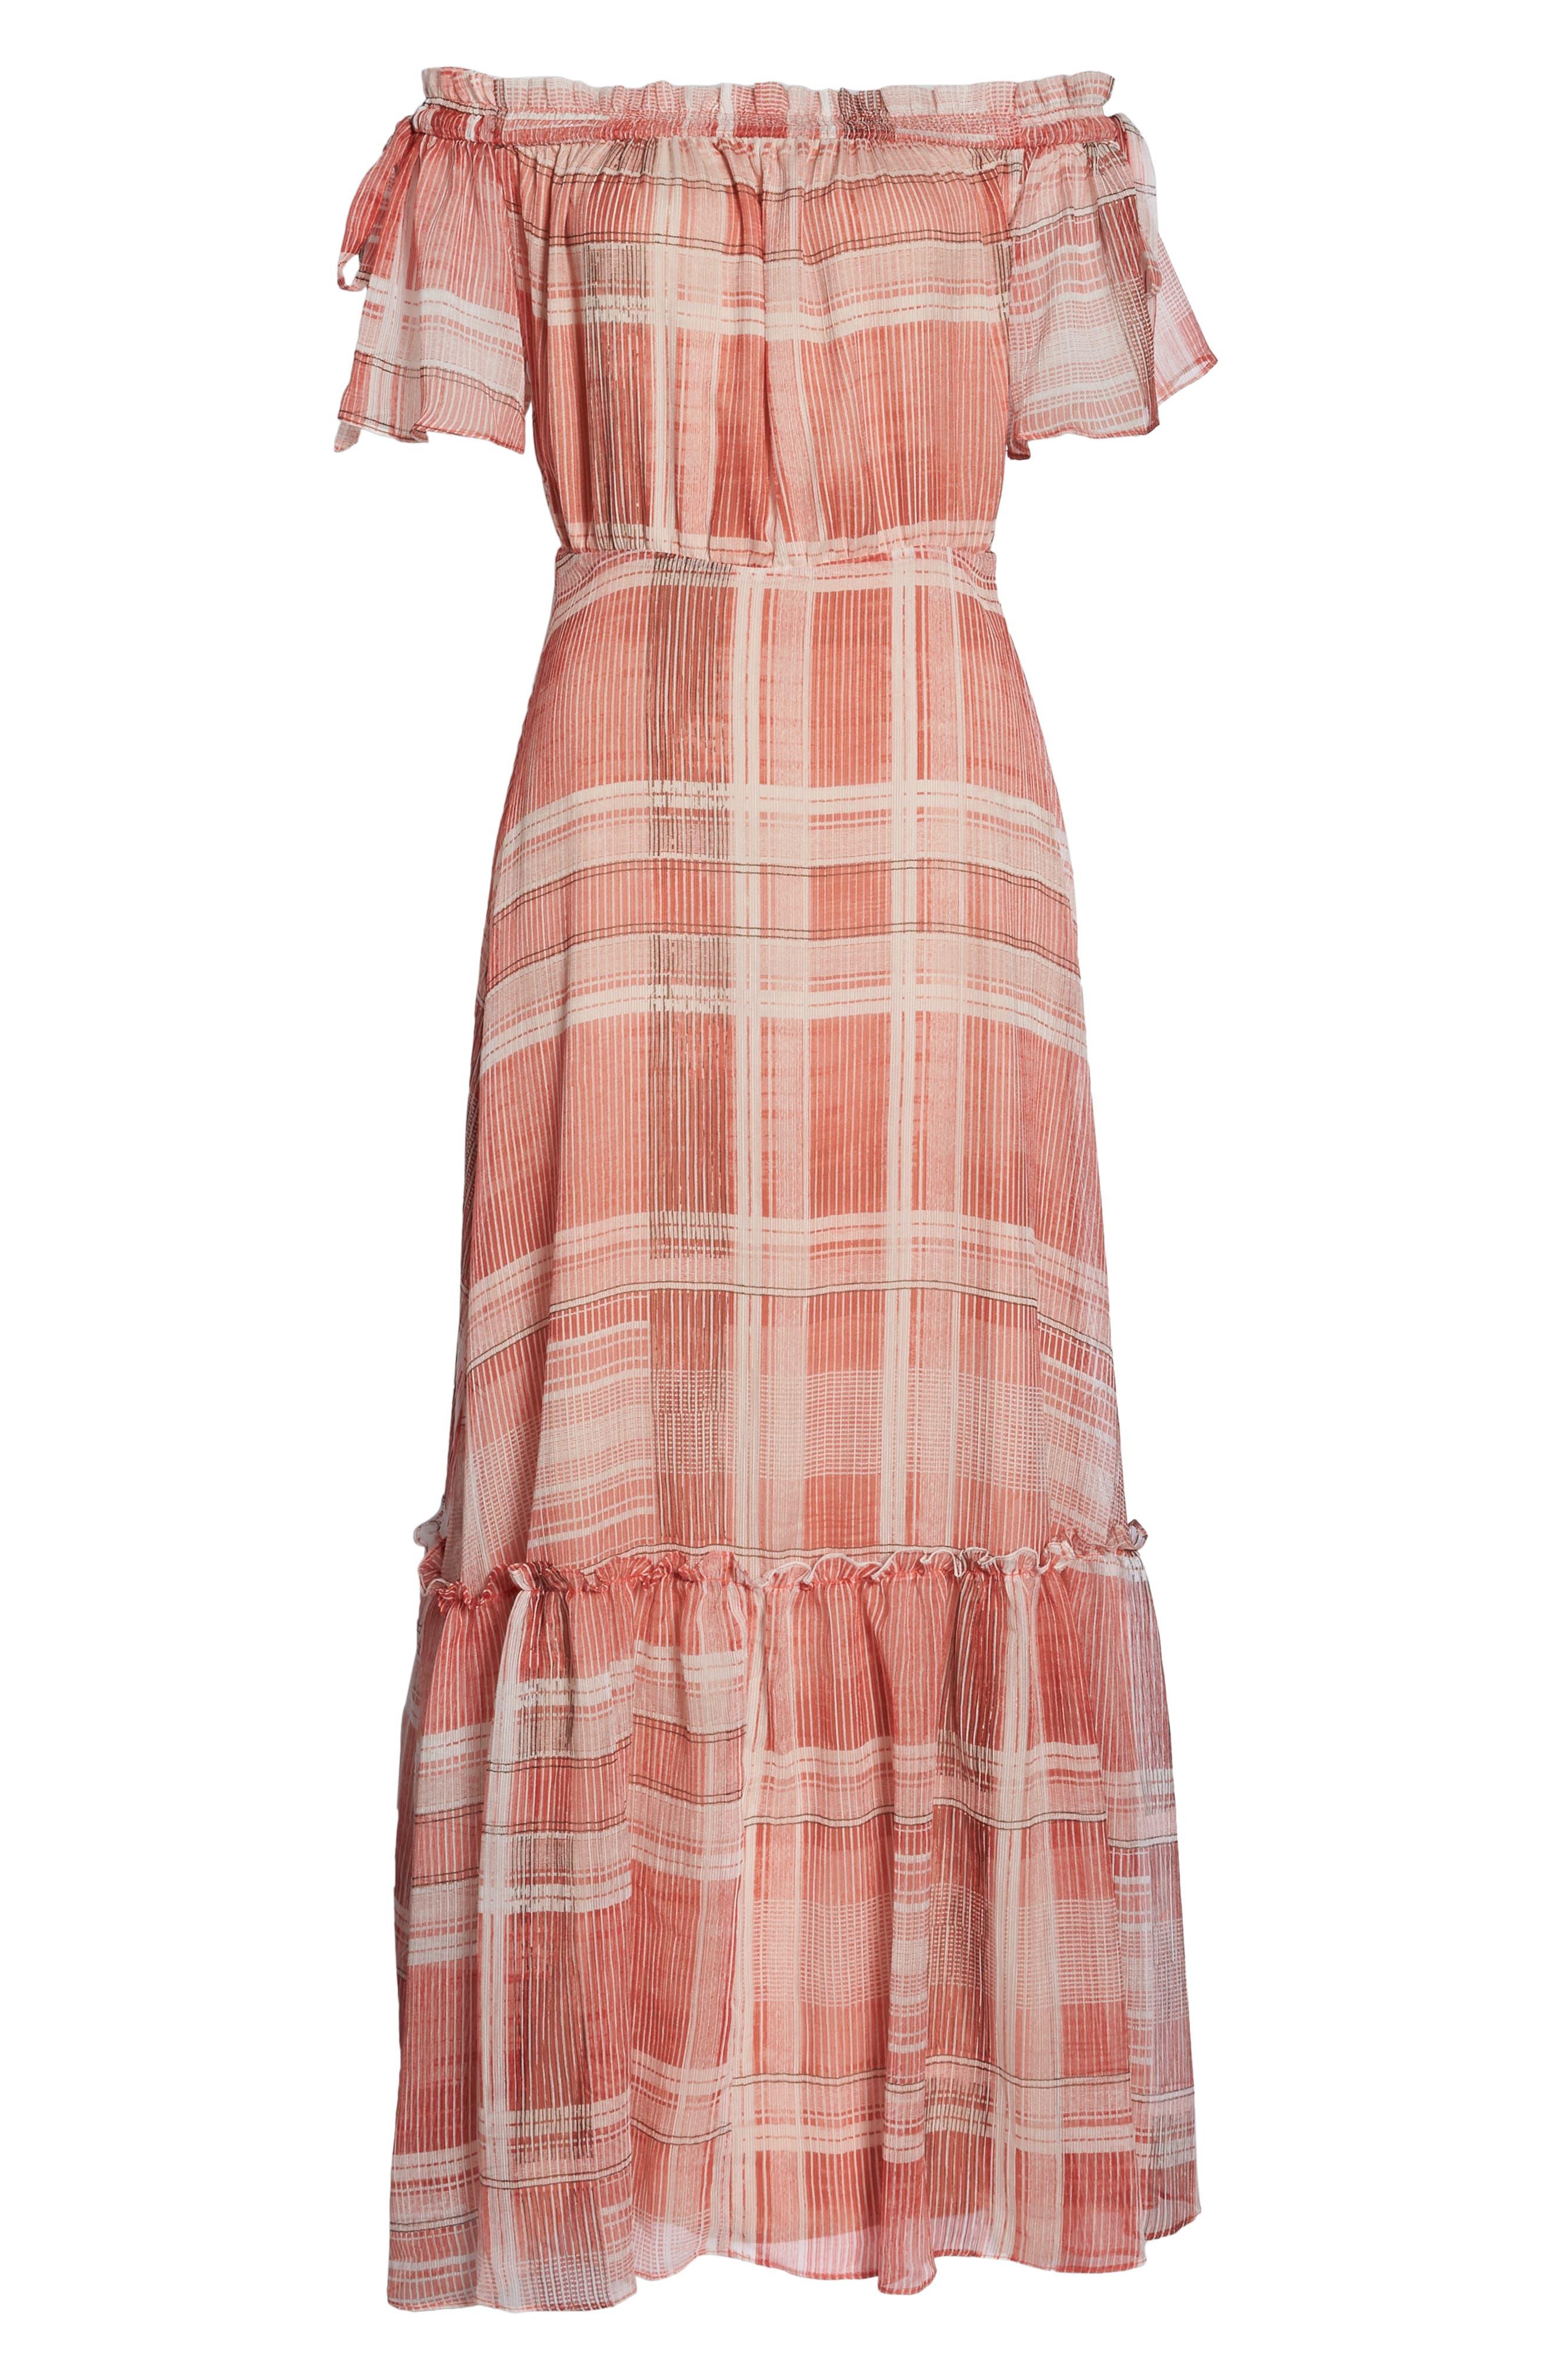 Plaid Off the Shoulder Maxi Dress,                             Alternate thumbnail 8, color,                             643